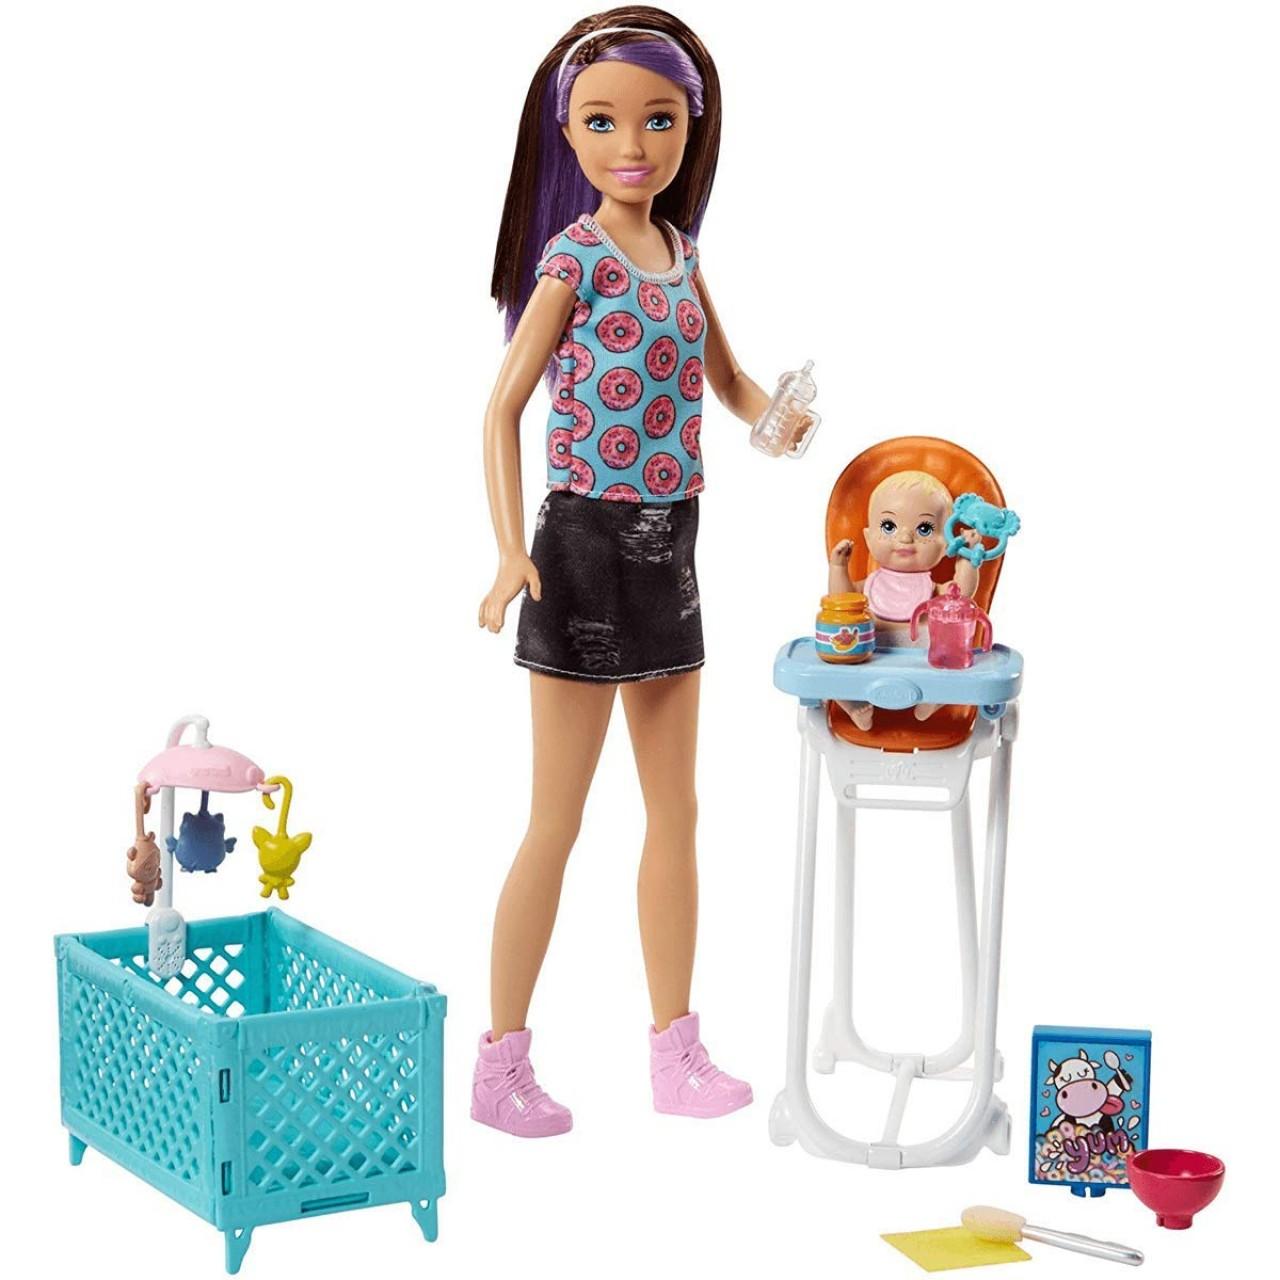 "Набор Барби Скиппер няня ""Кормление"" (FHY98) Barbie Skipper Babysitters Inc. Doll and Feeding Playset"